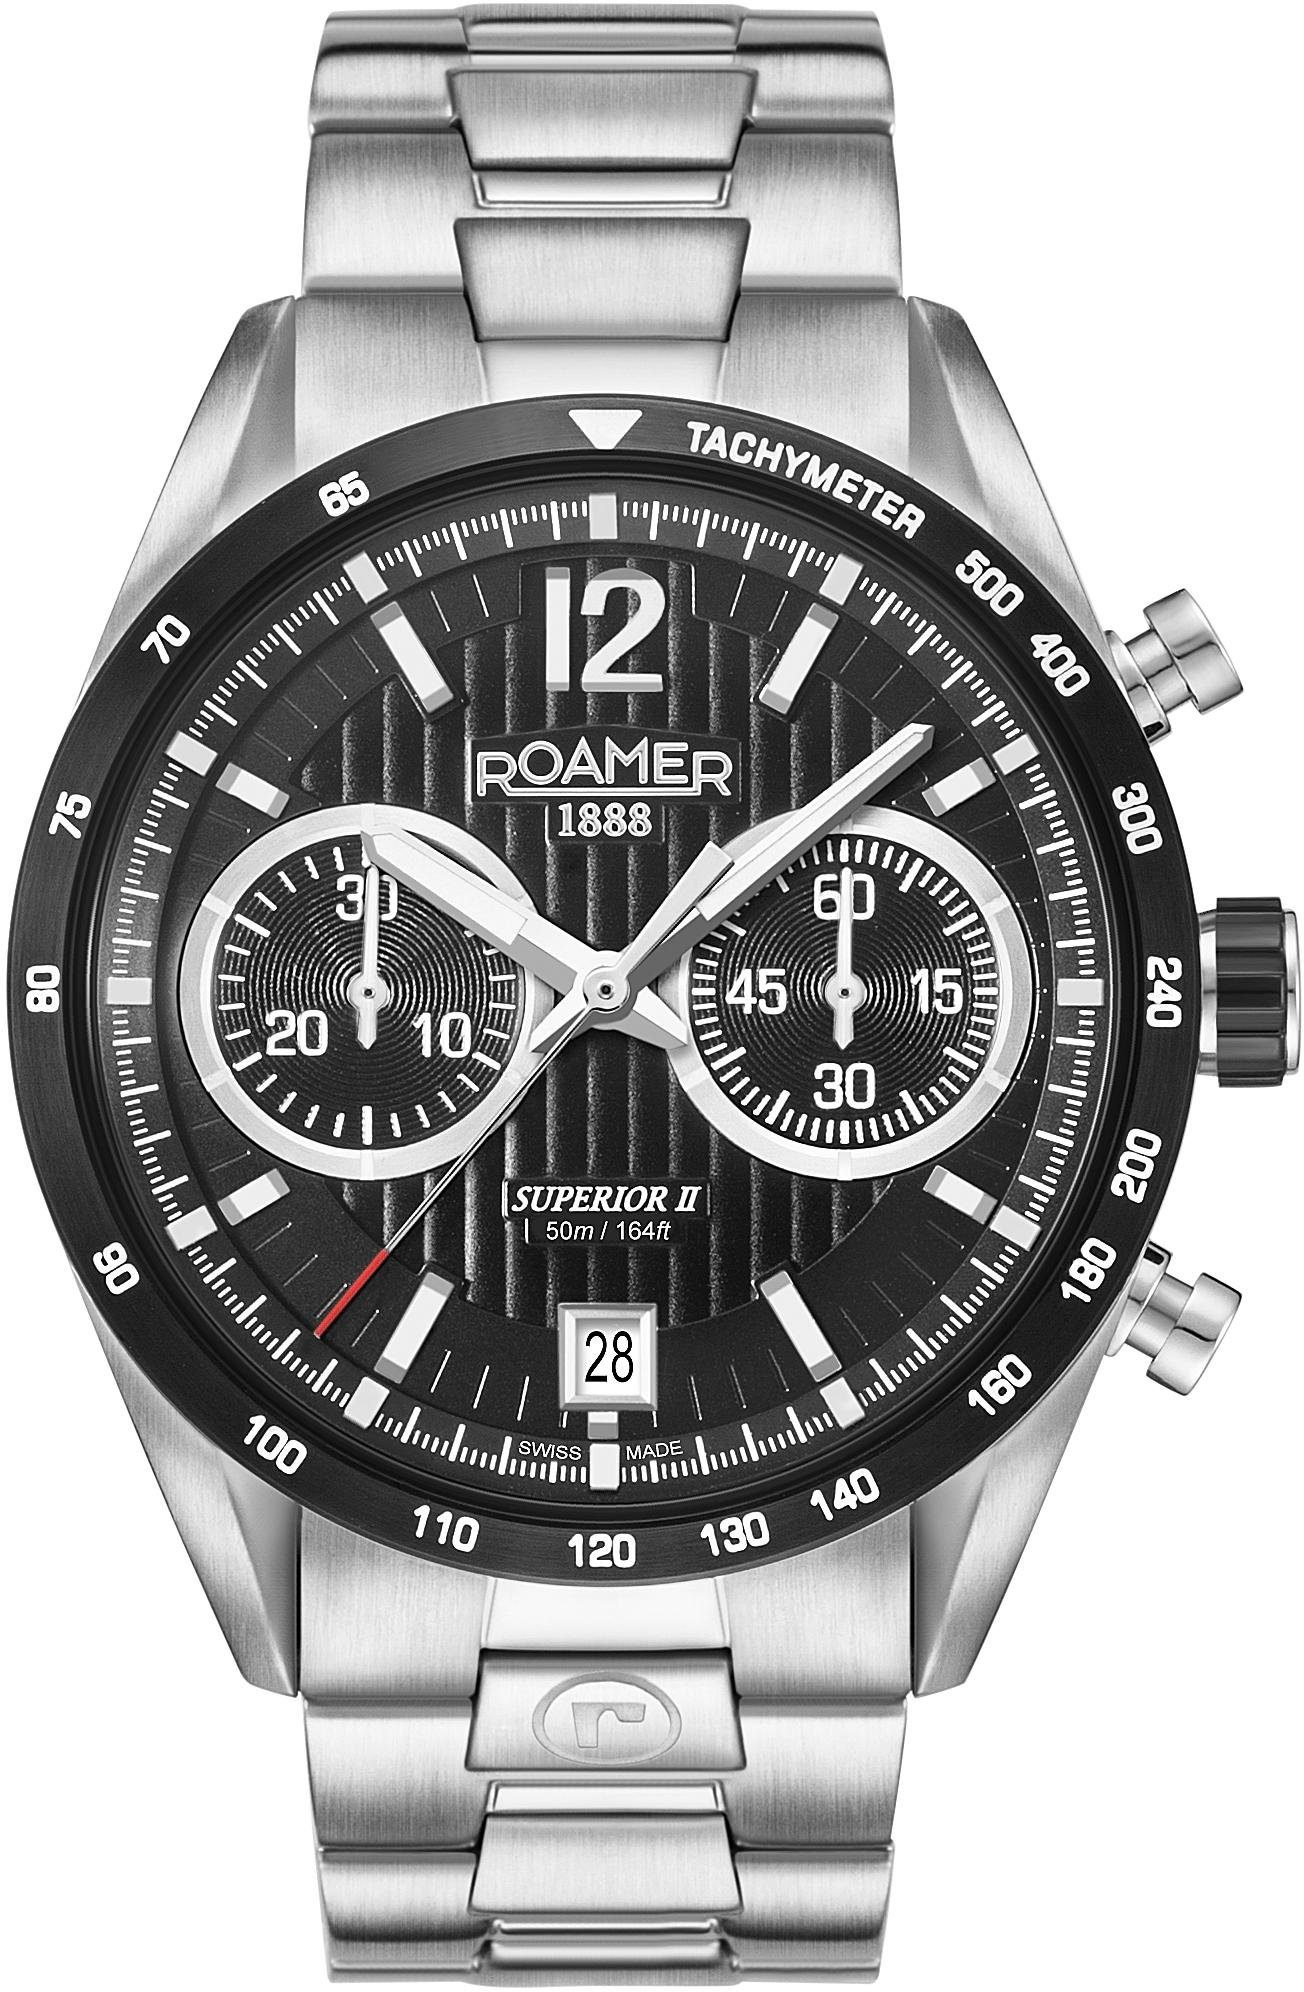 Roamer Chronograph »SUPERIOR CHRONO II, 510902 41 54 50« mit kleiner Sekunde